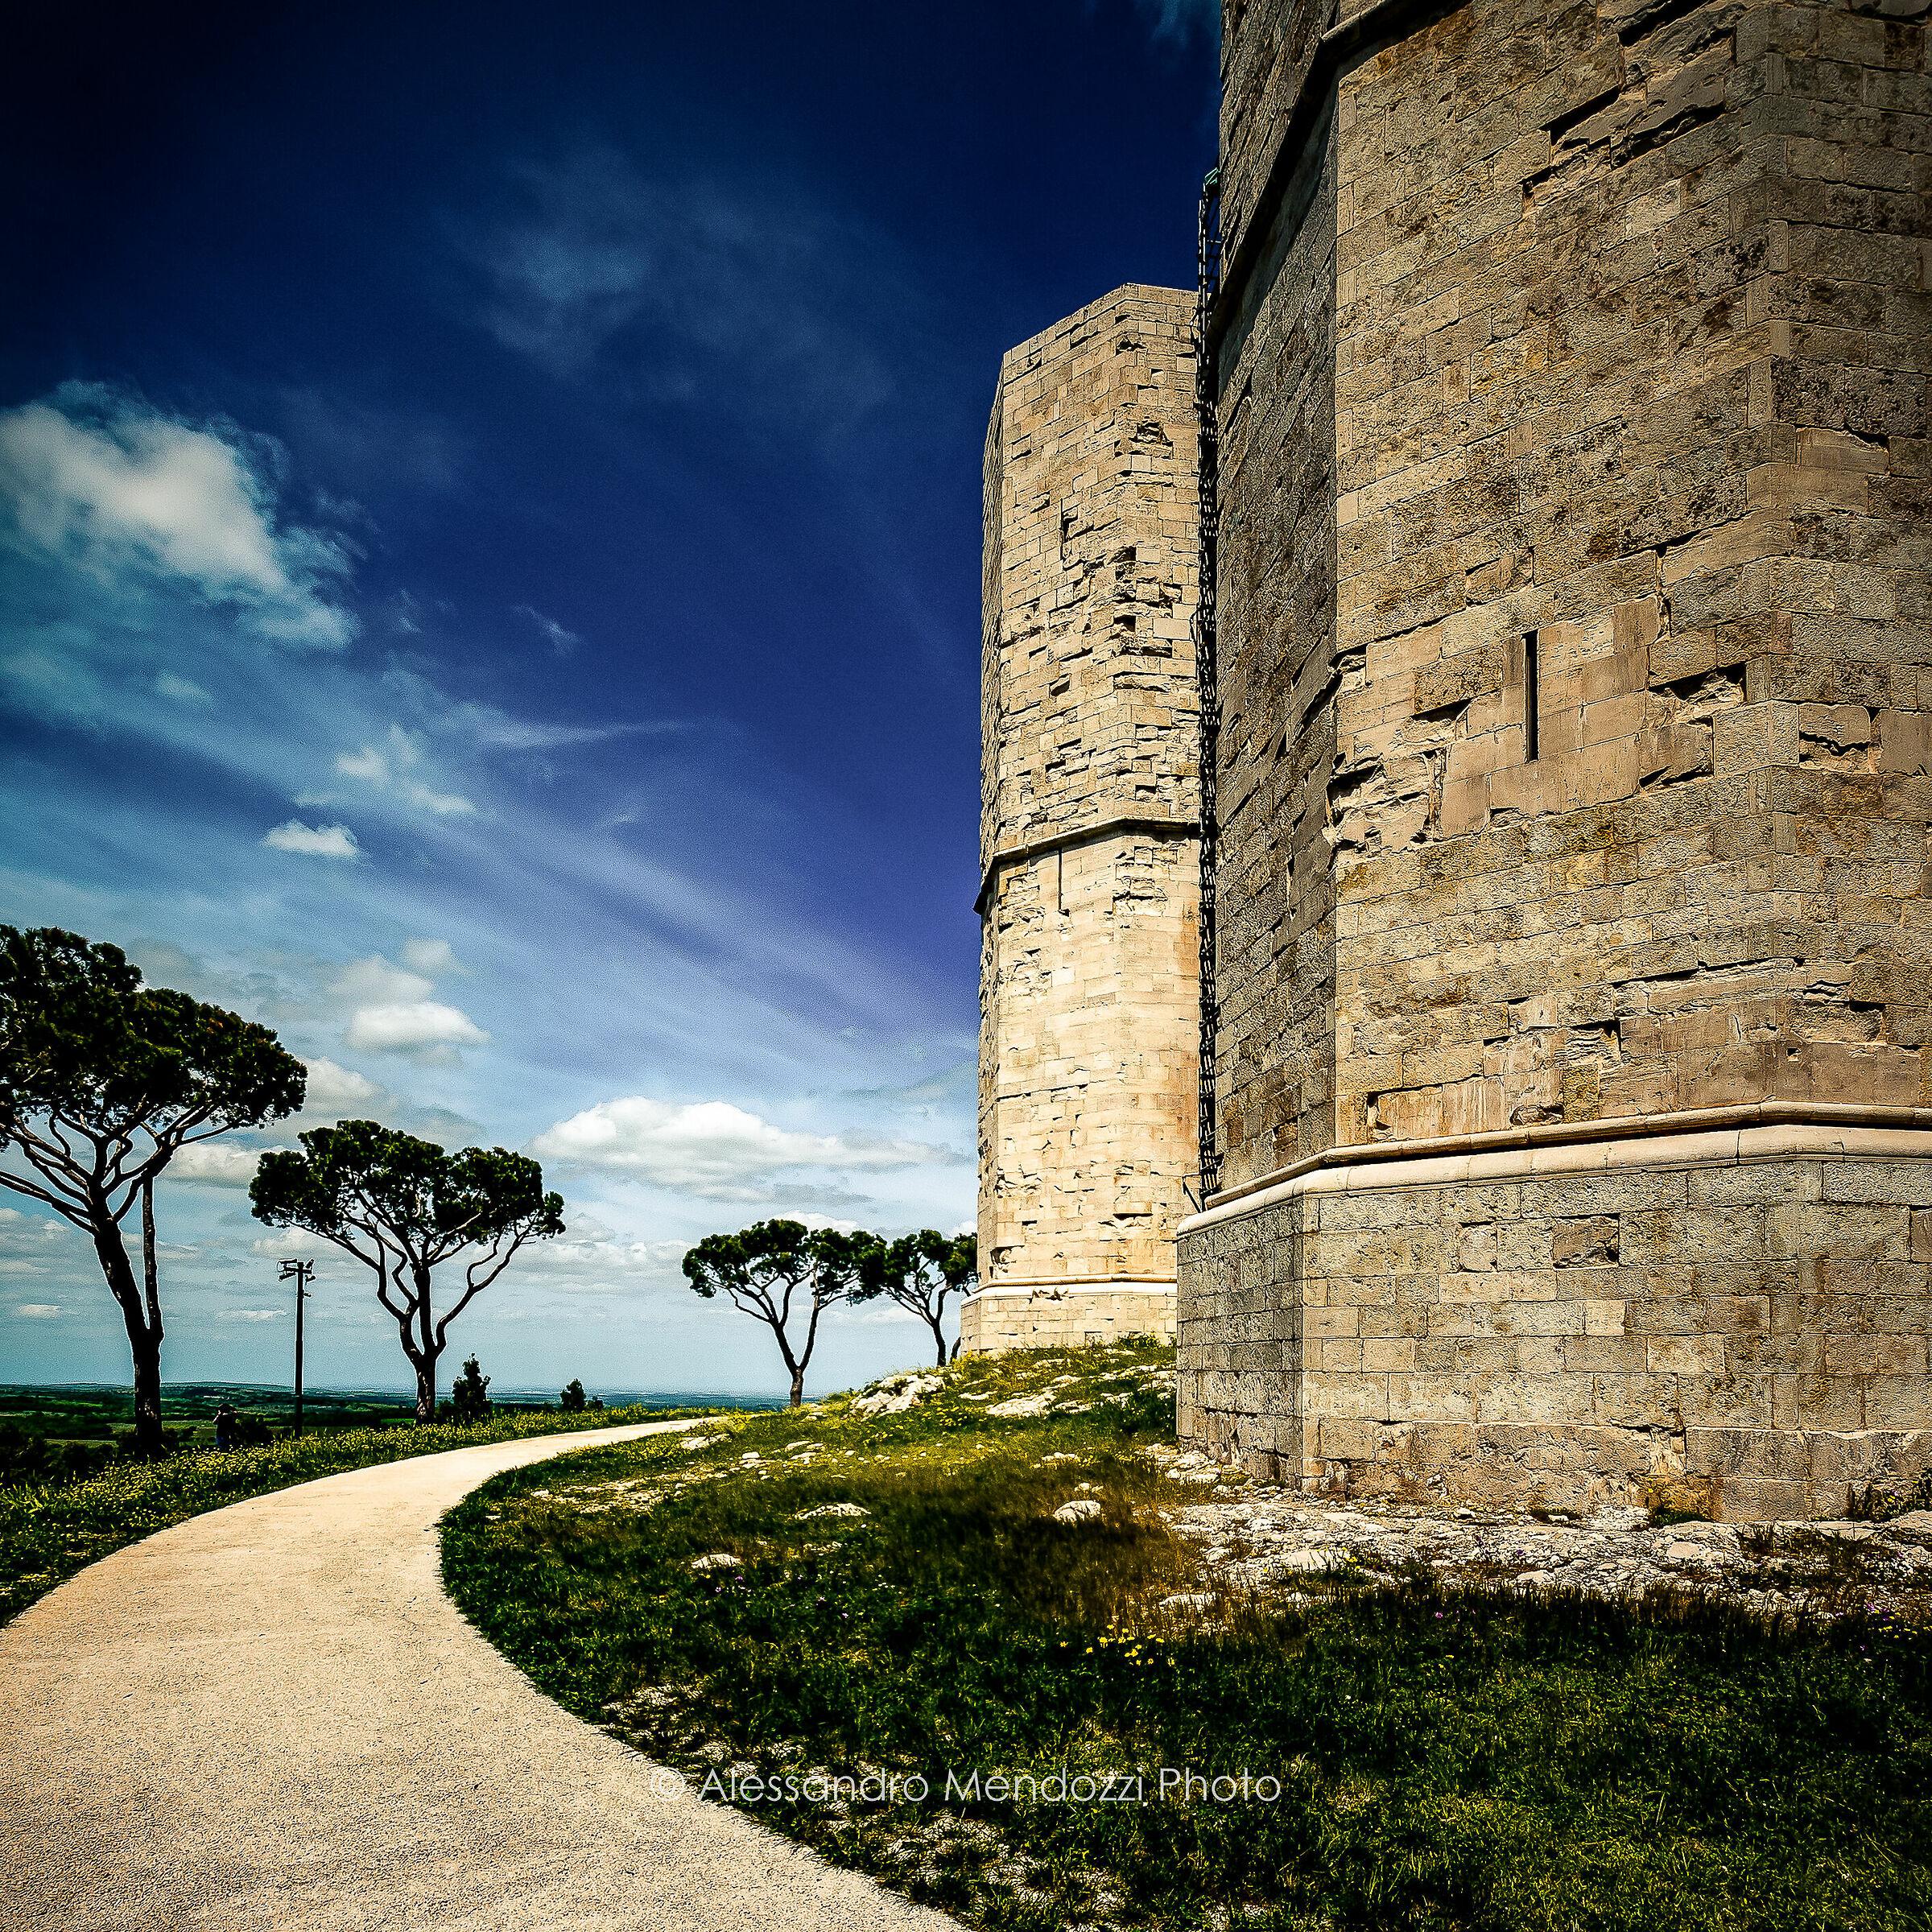 castello_5 | JuzaPhoto